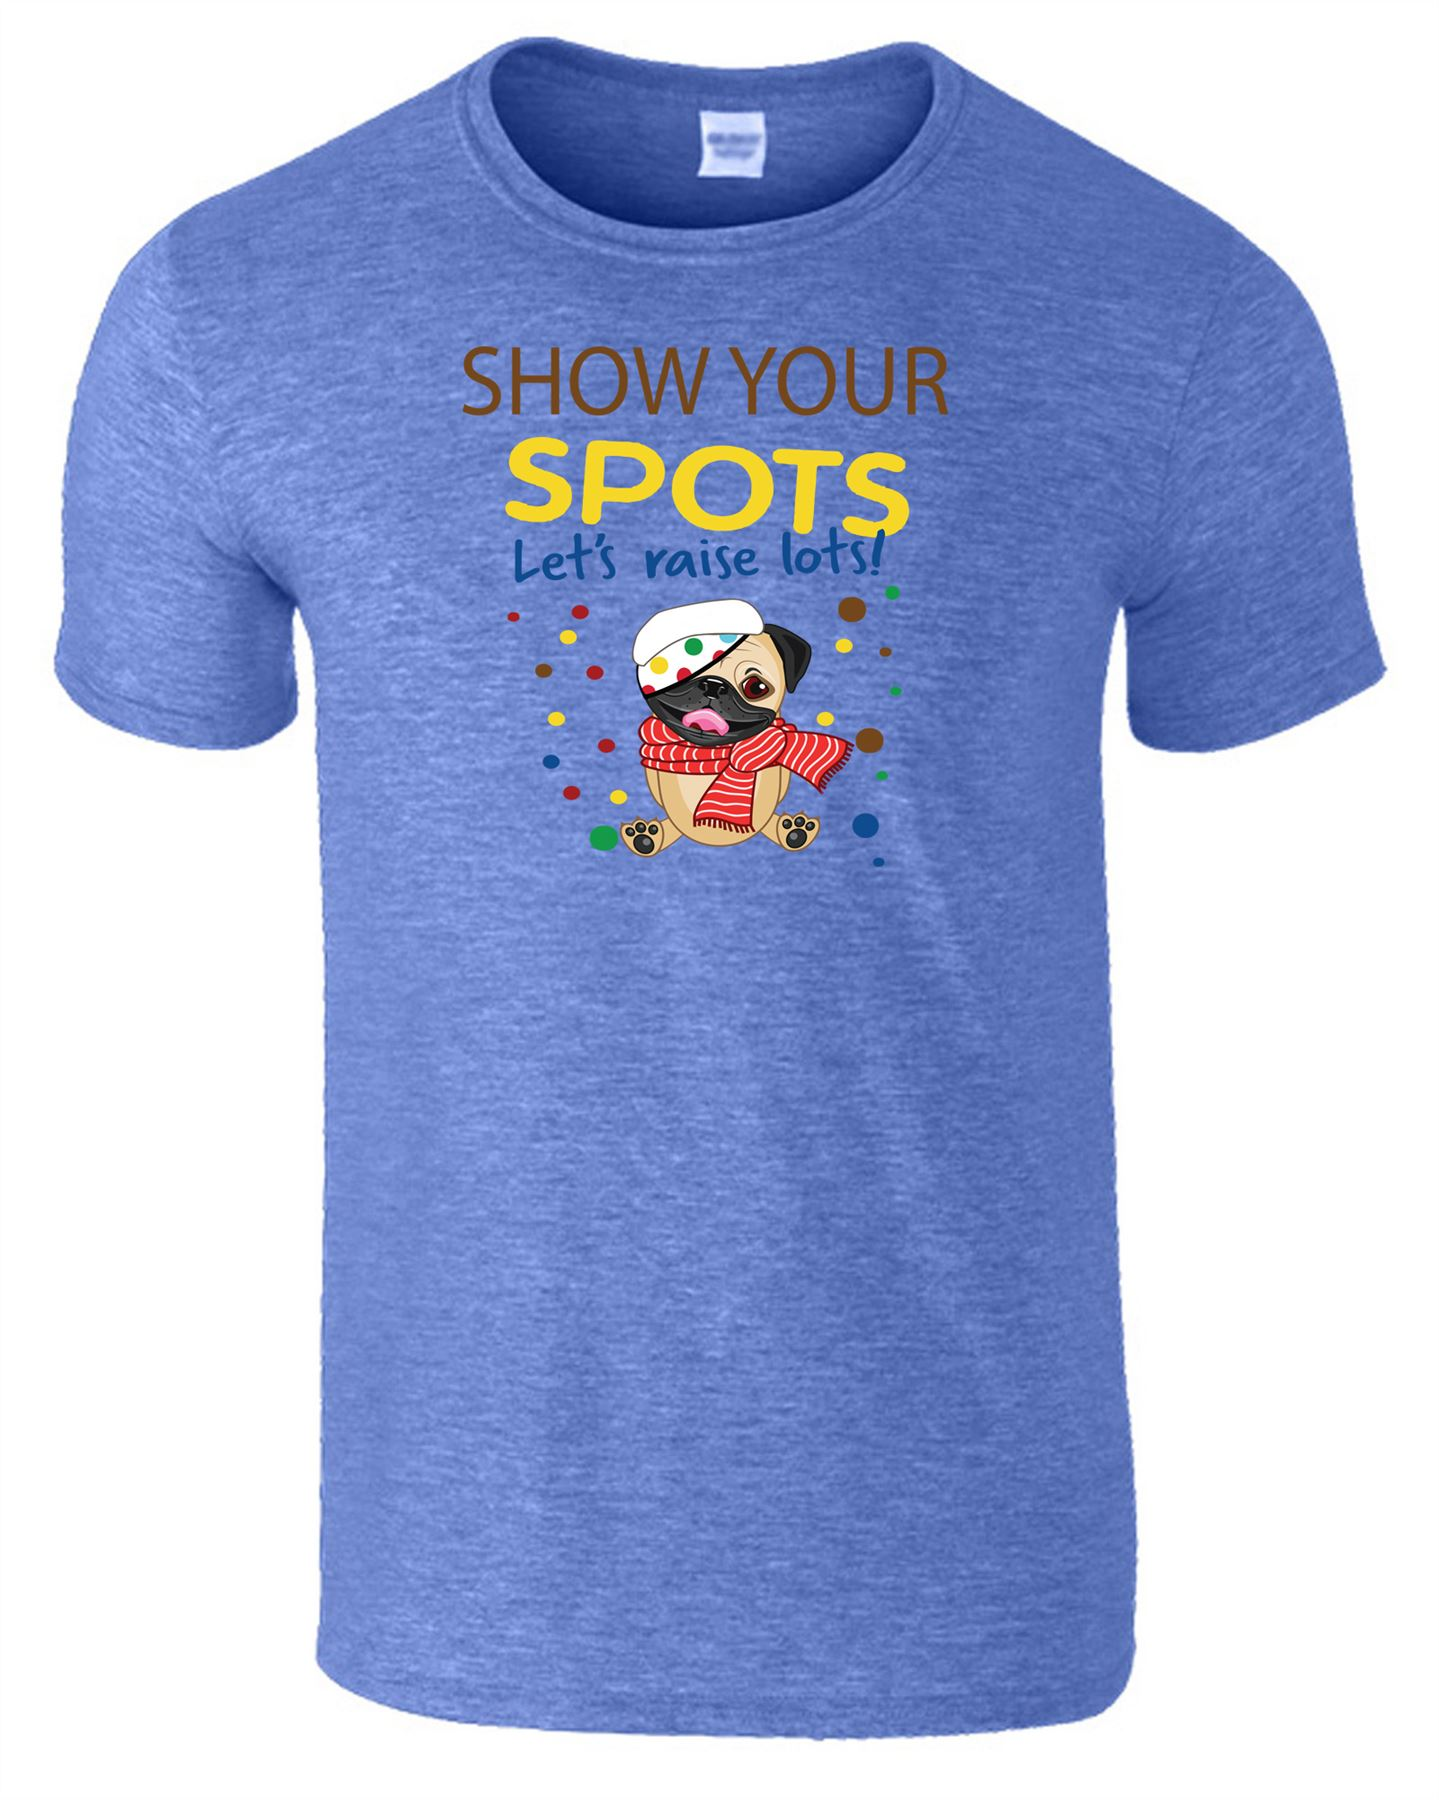 Mens Kids Tshirt Funny Novelty Boys Girls Short Sleeve Top Tee T-Shirt